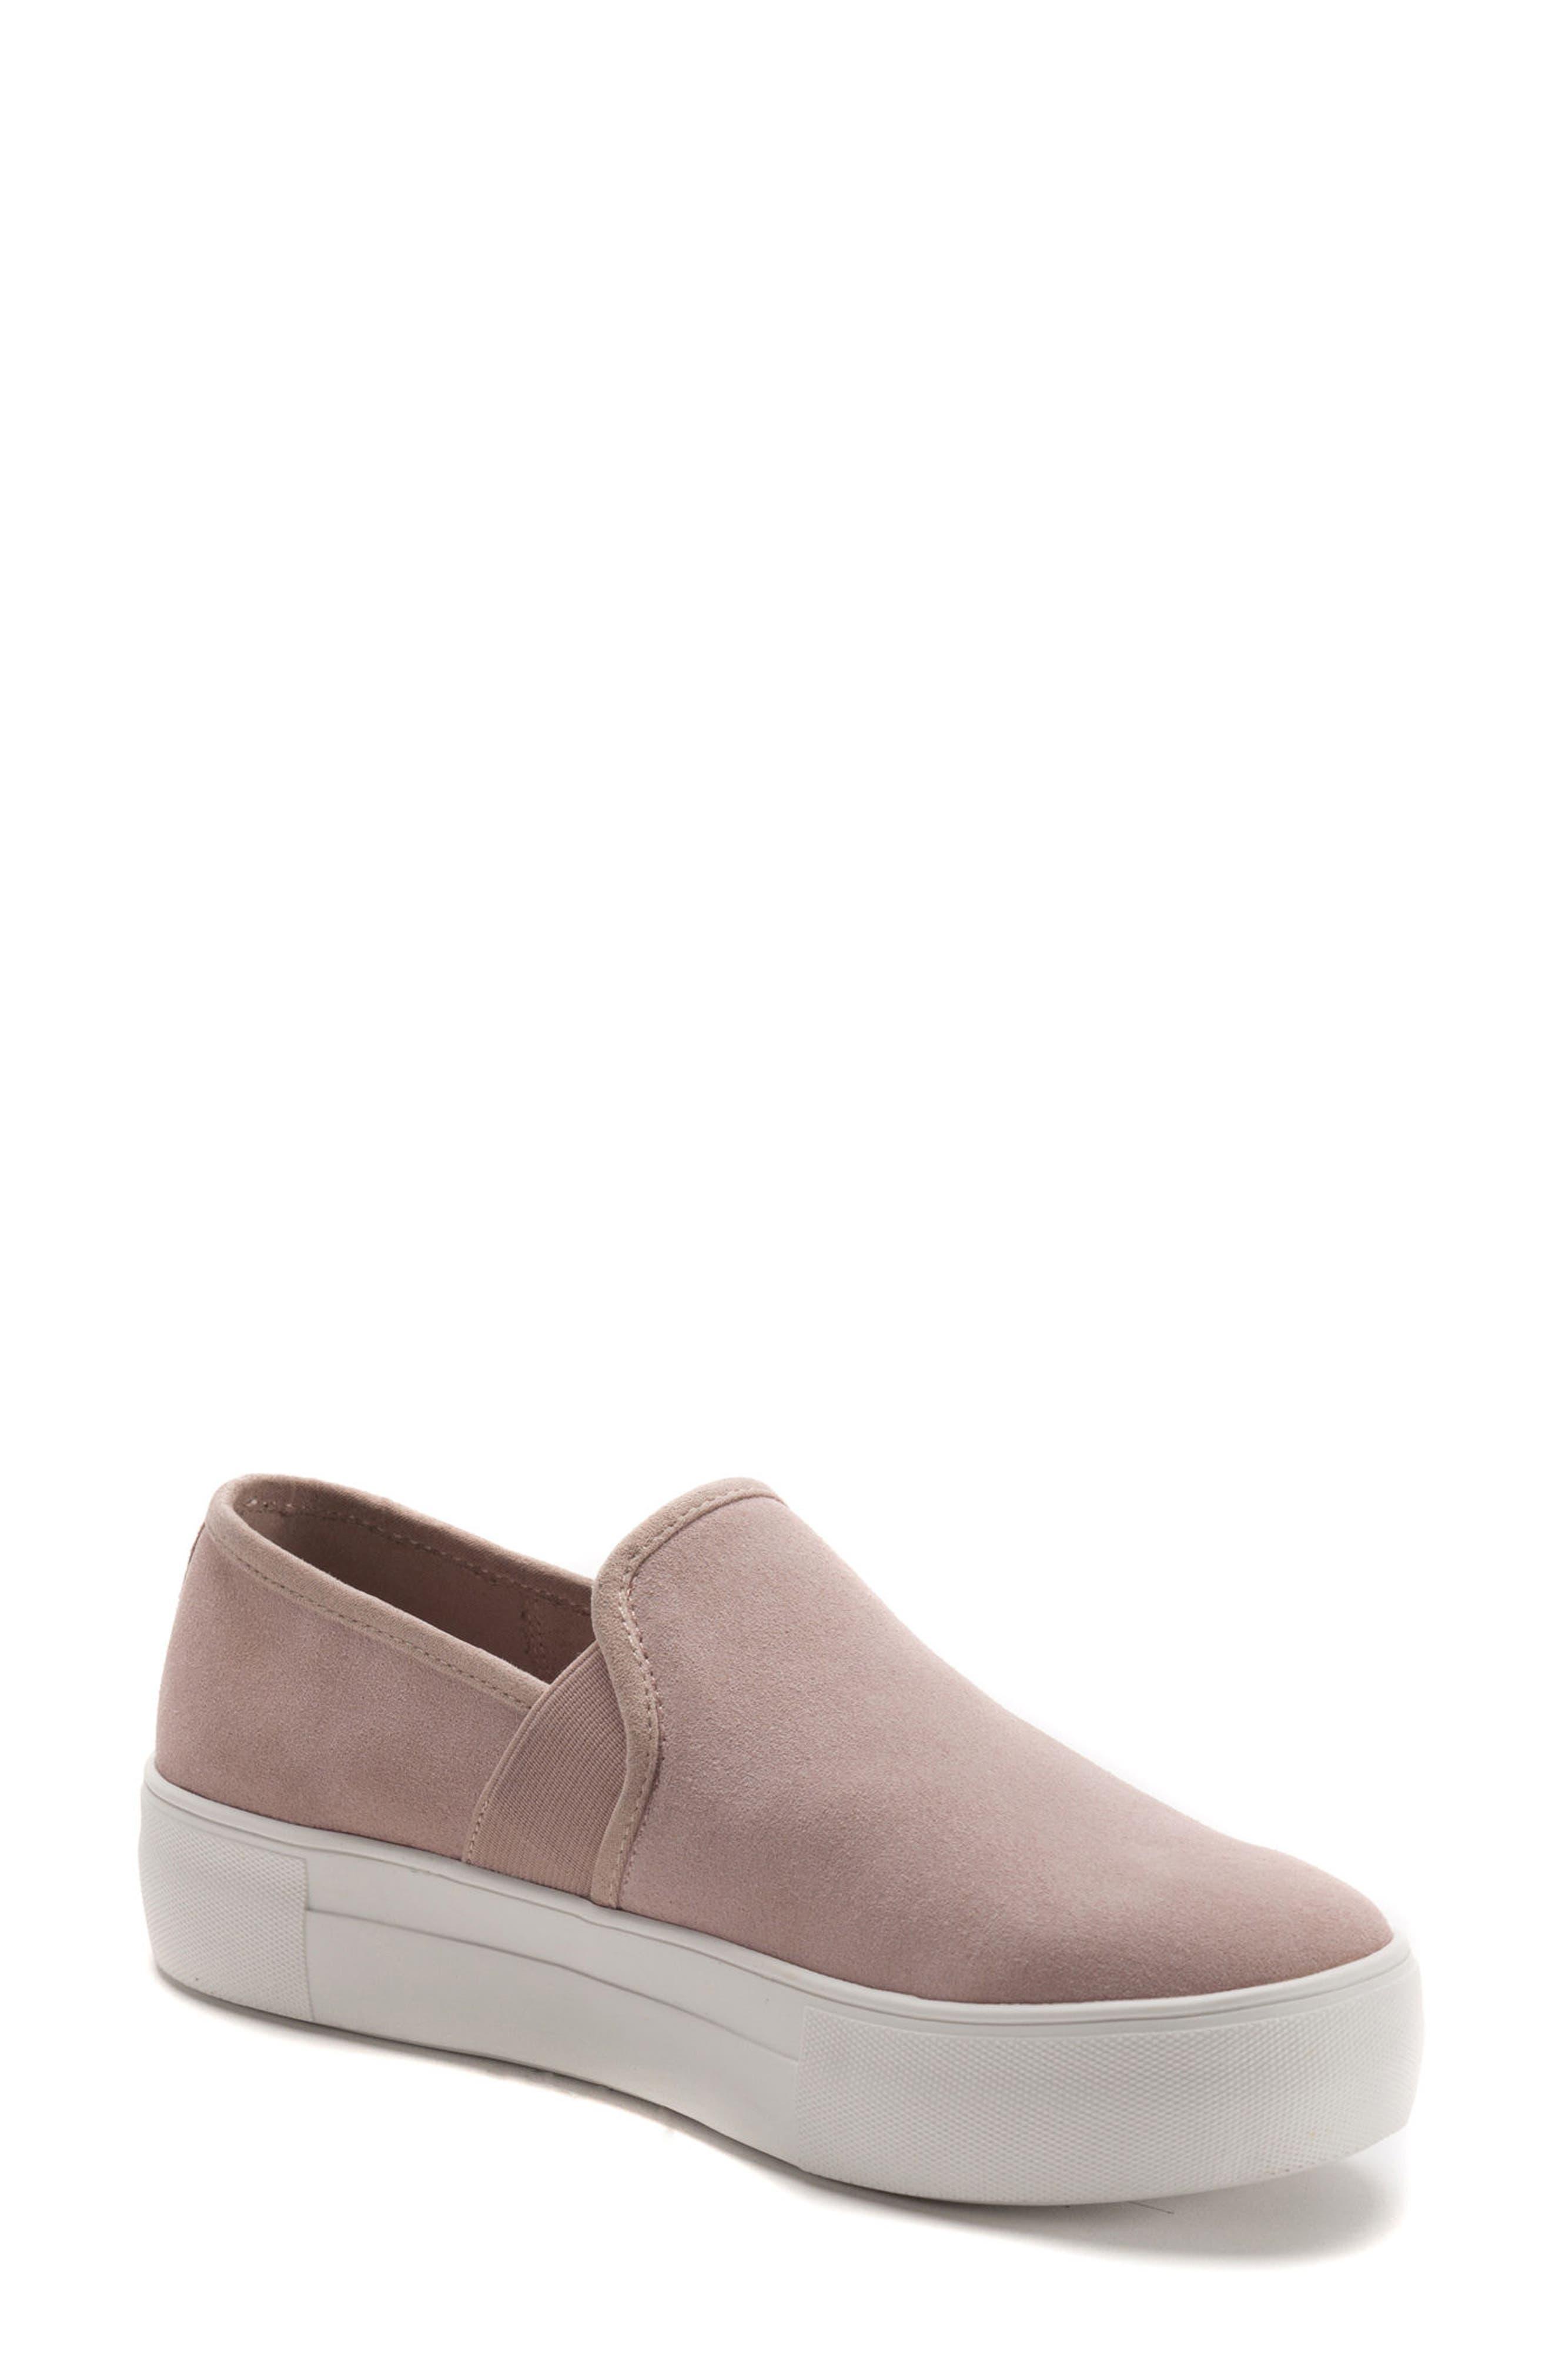 Blondo Glance Waterproof Sneaker, Pink